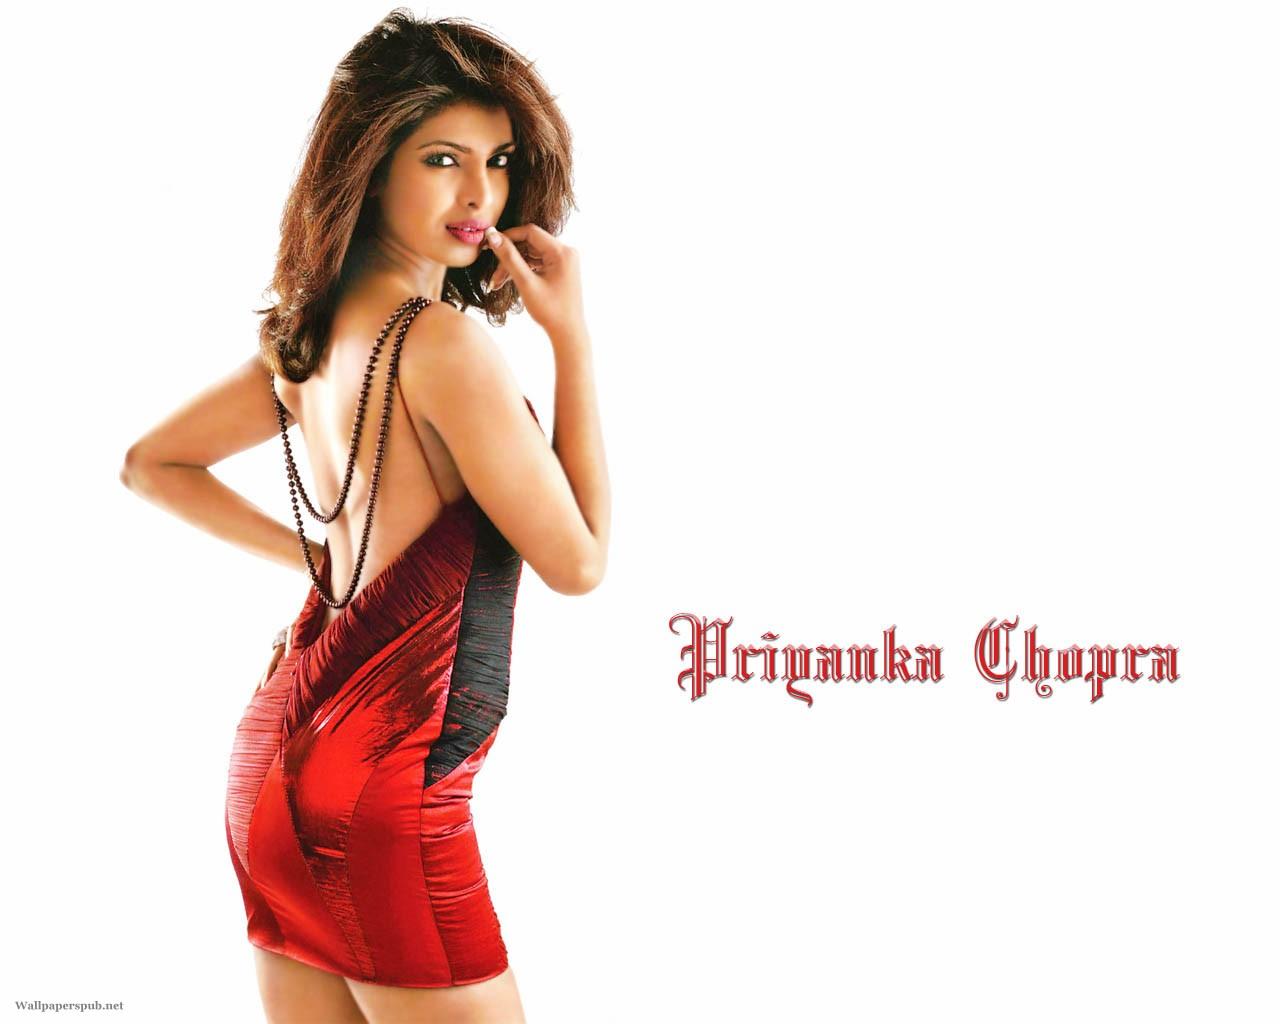 Priyanka chopra backless hot wallpaper